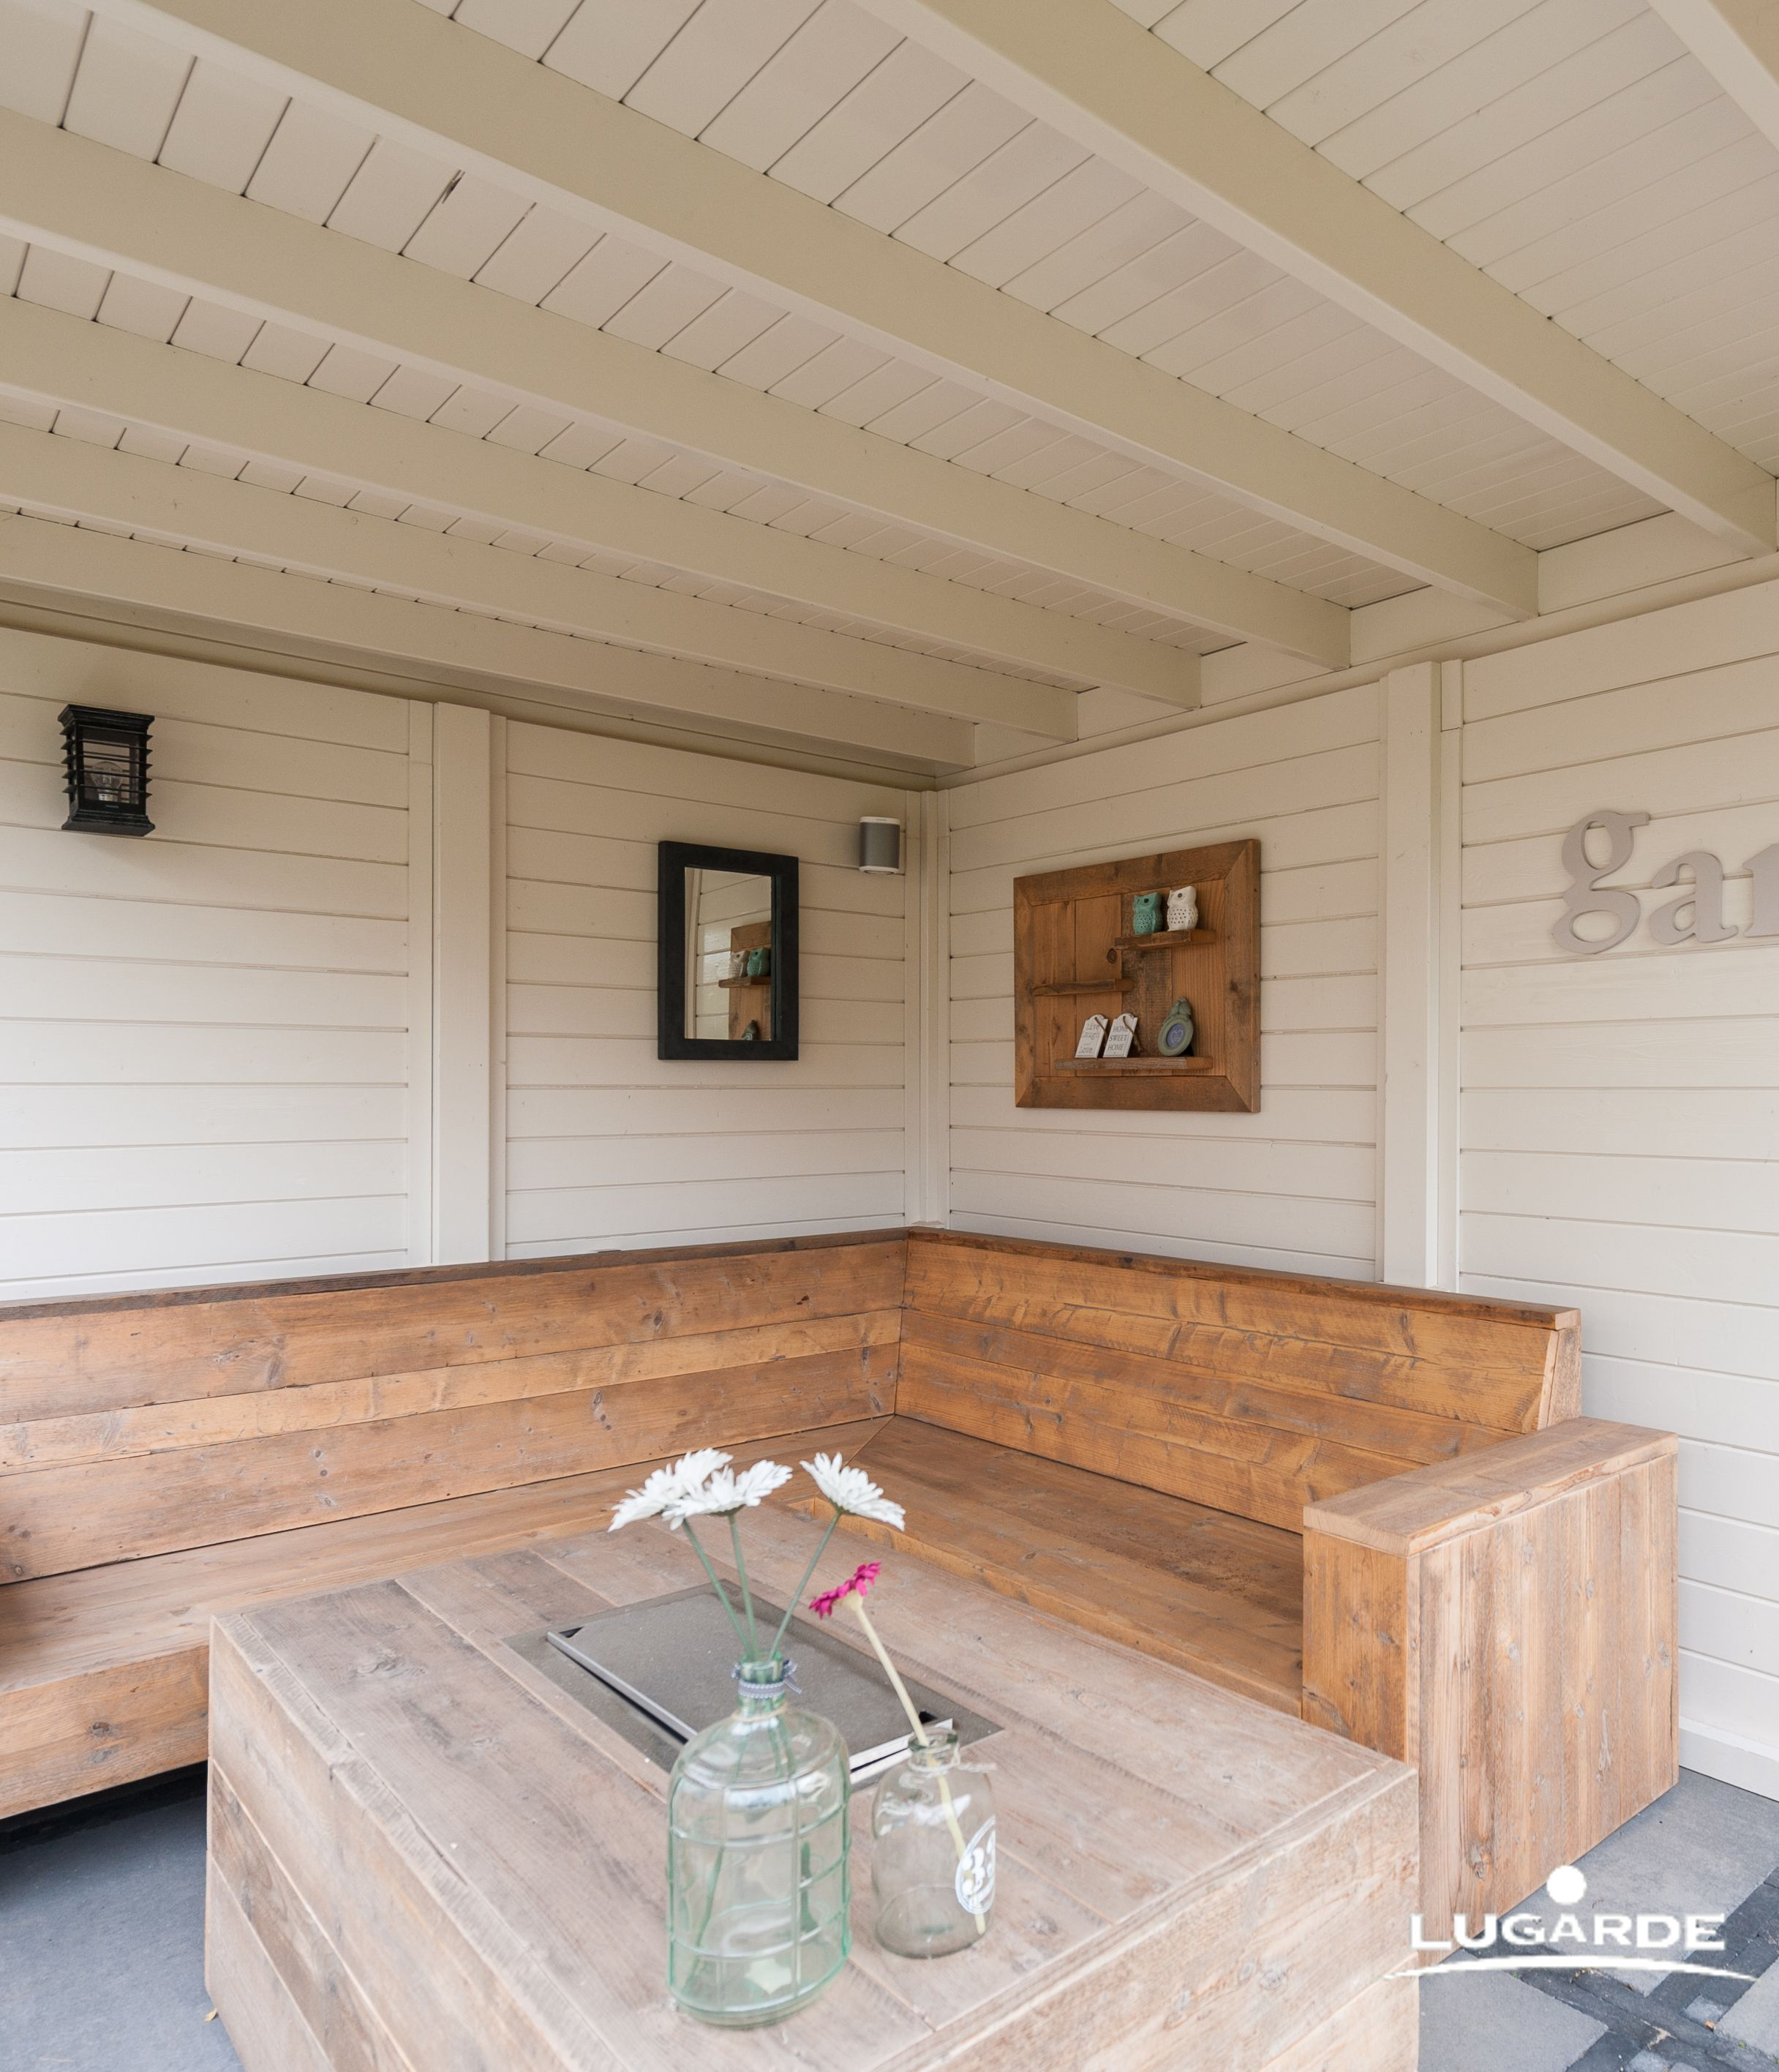 rustikal stilvoll klassisch modern skandinavisch beim anblick dieser inneneinrichtung aus. Black Bedroom Furniture Sets. Home Design Ideas